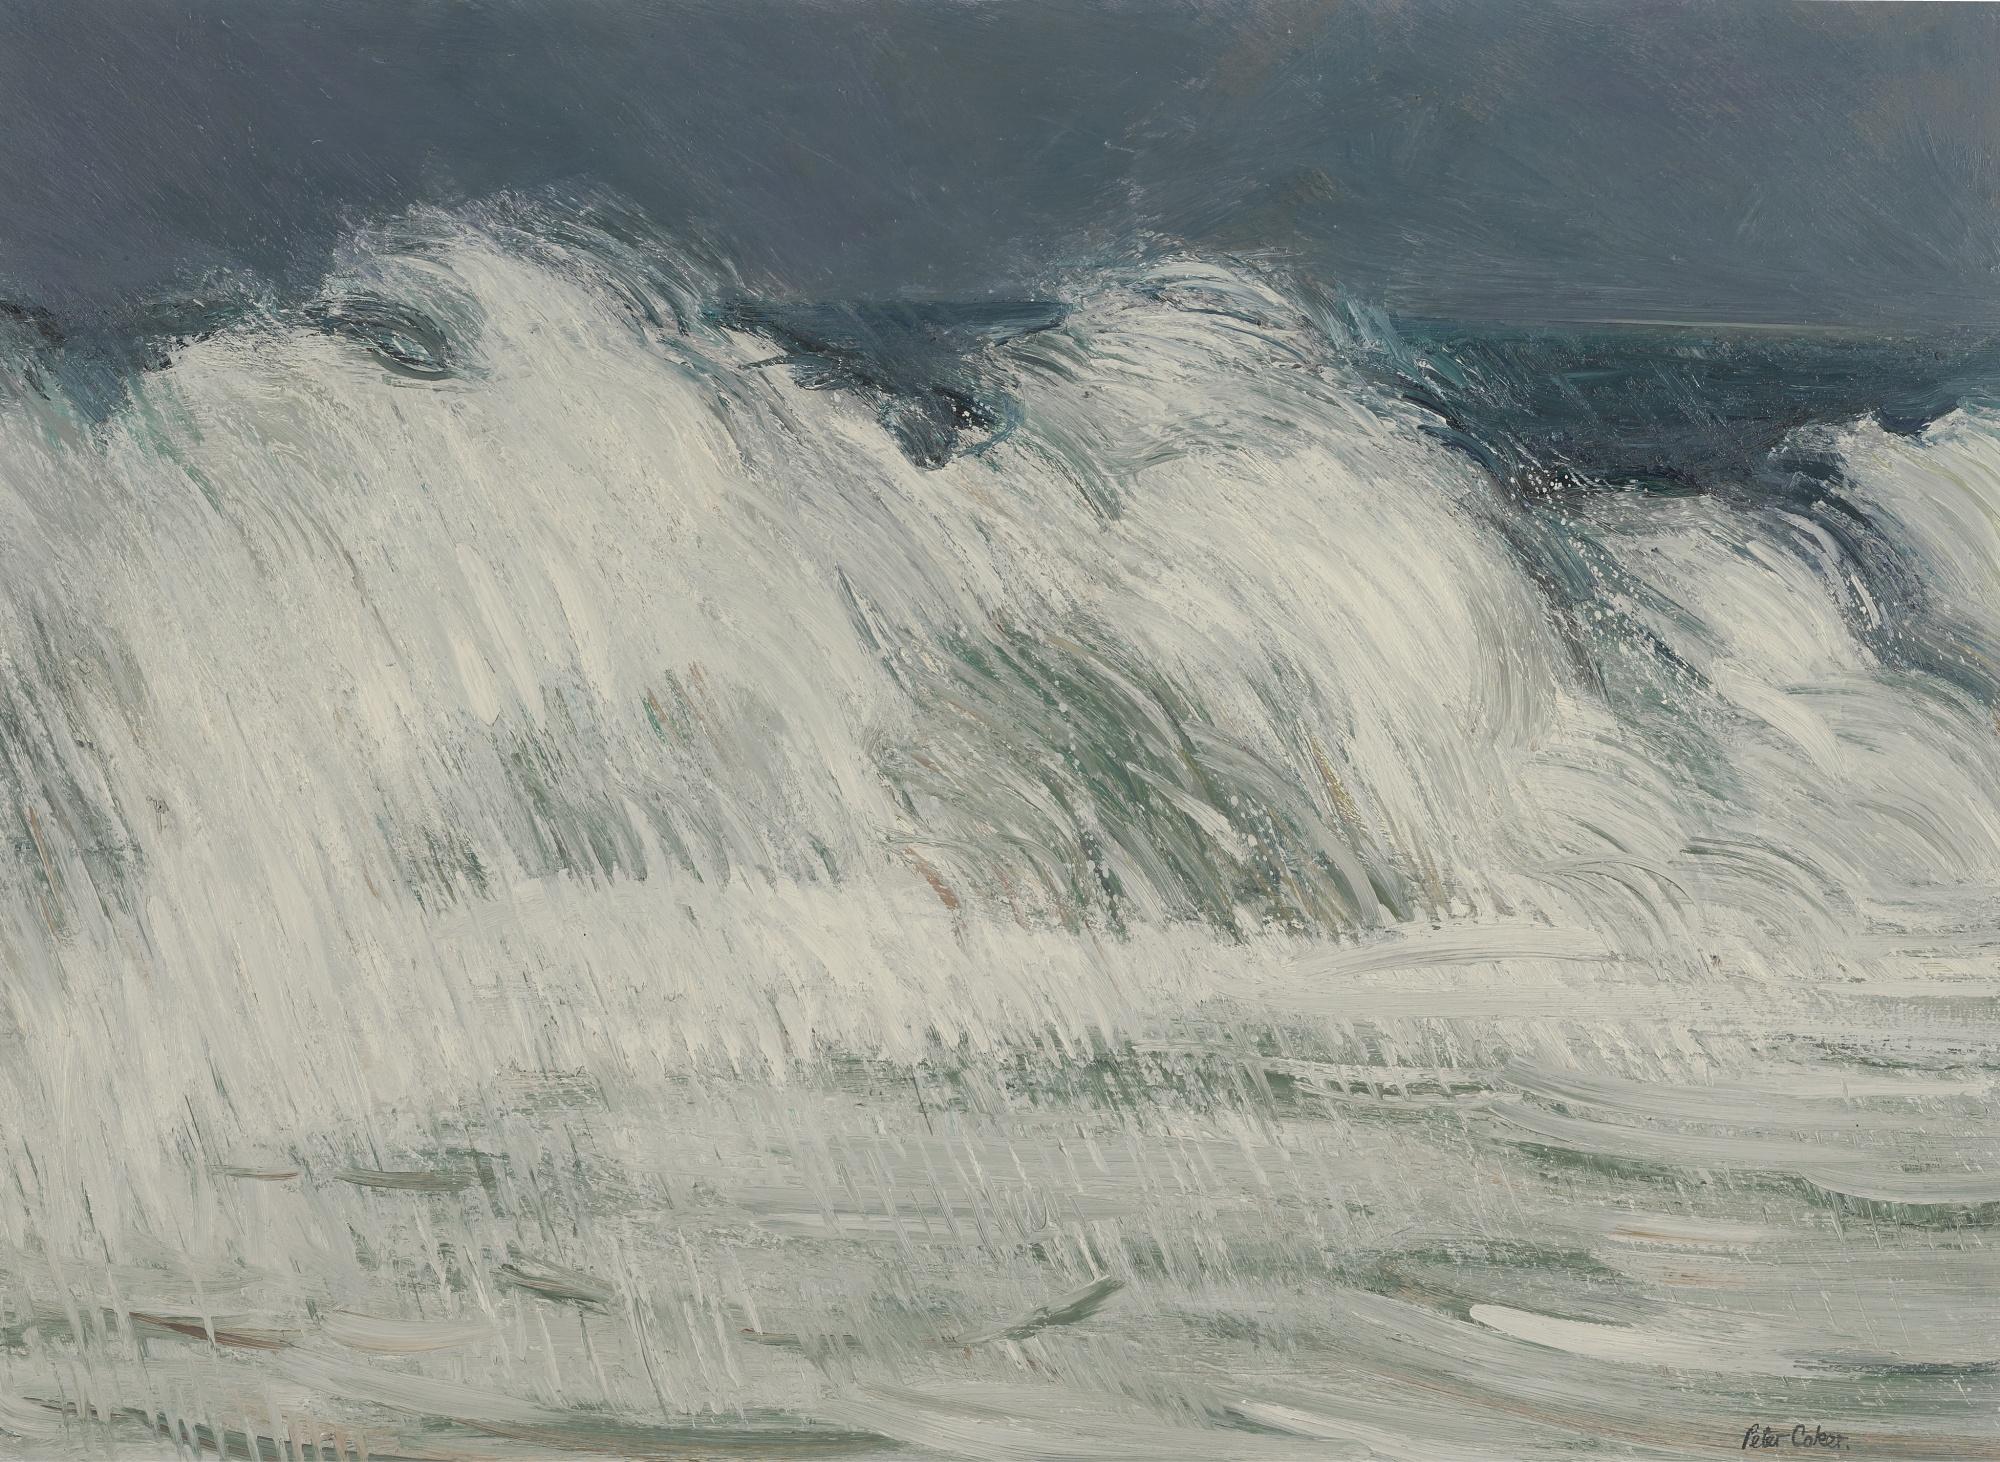 Peter Coker-High Seas At Aldeburgh Suffolk No.2-1964